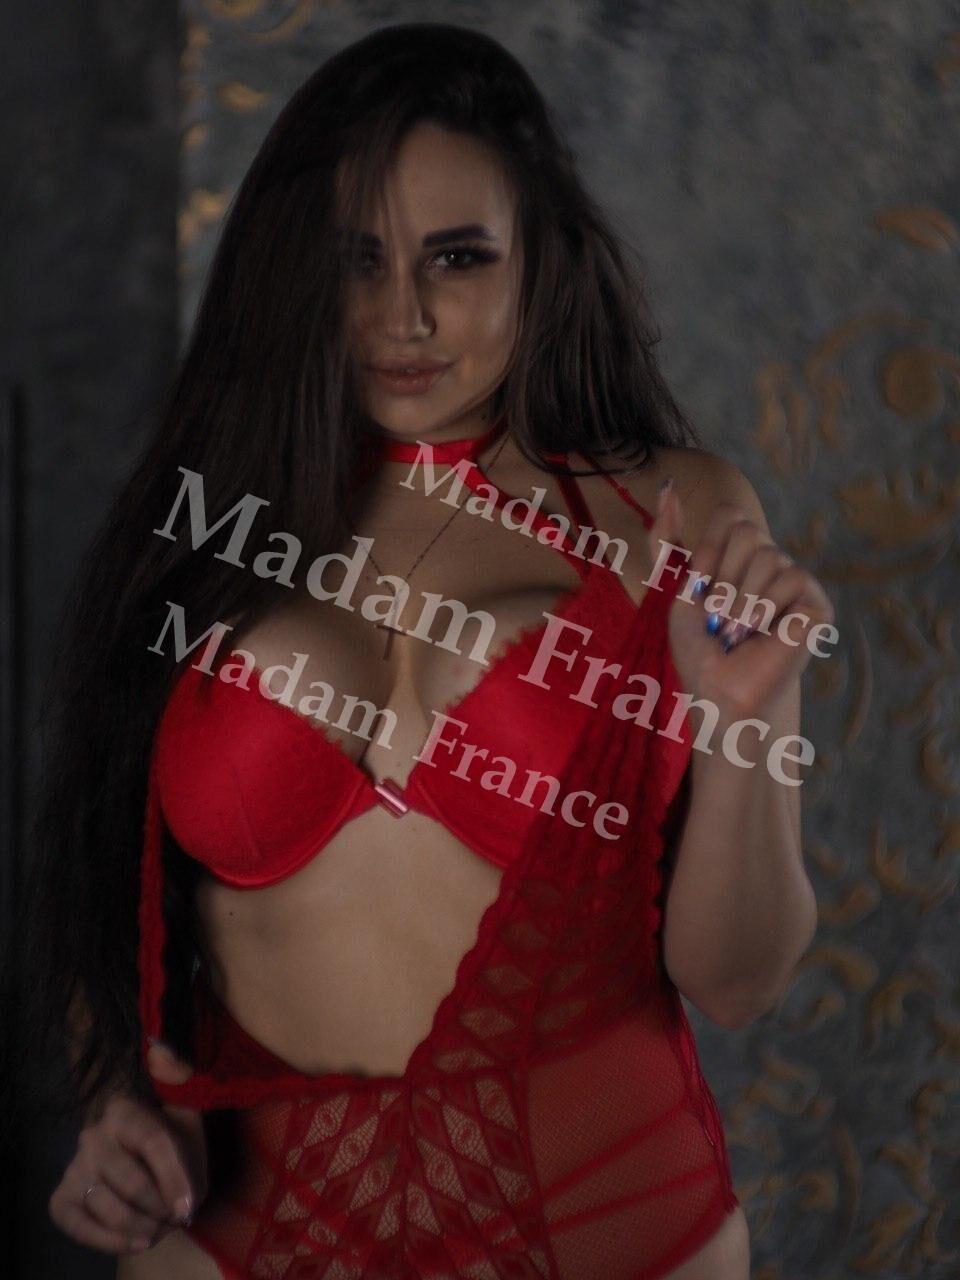 Jane model on Madam France escort service